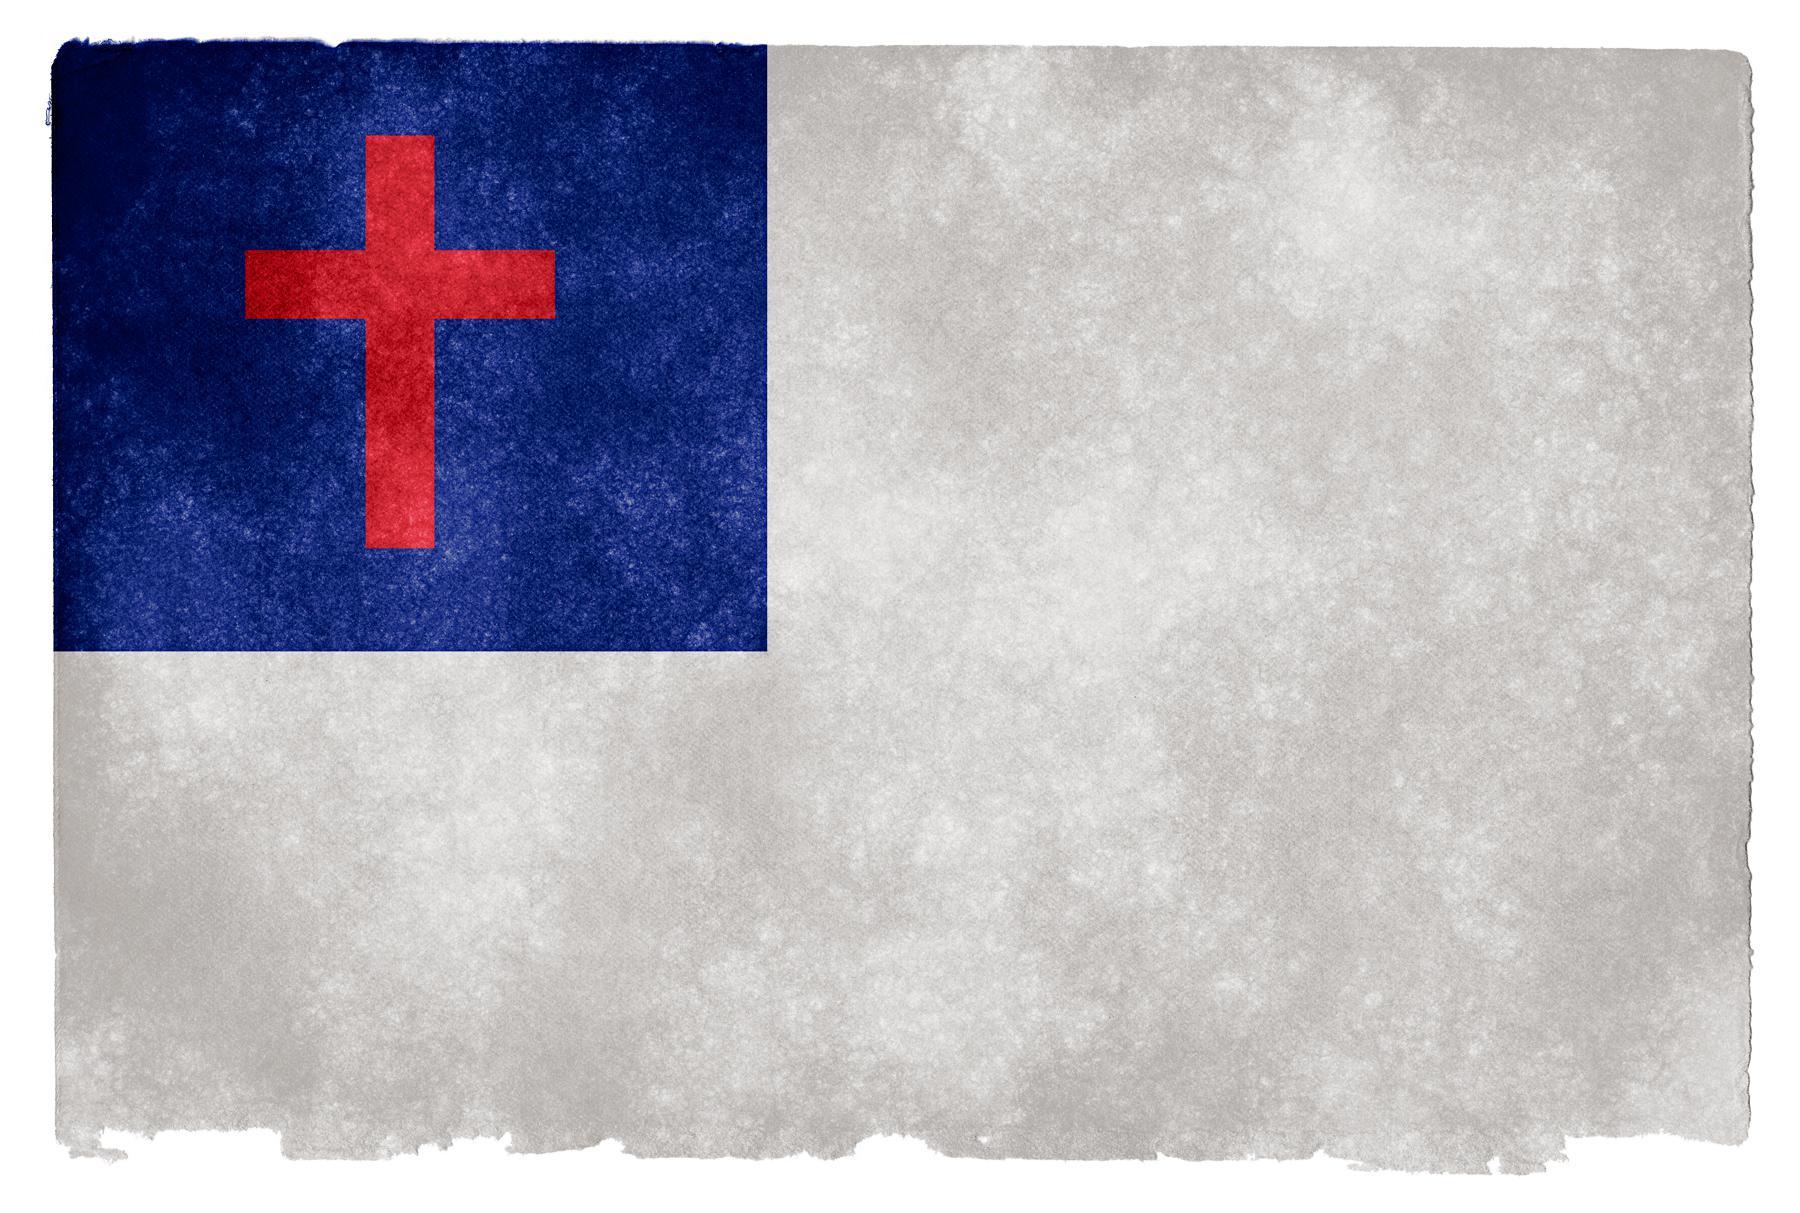 CHRISTIAN FLAG WALLPAPER - (#89790) - HD Wallpapers ...